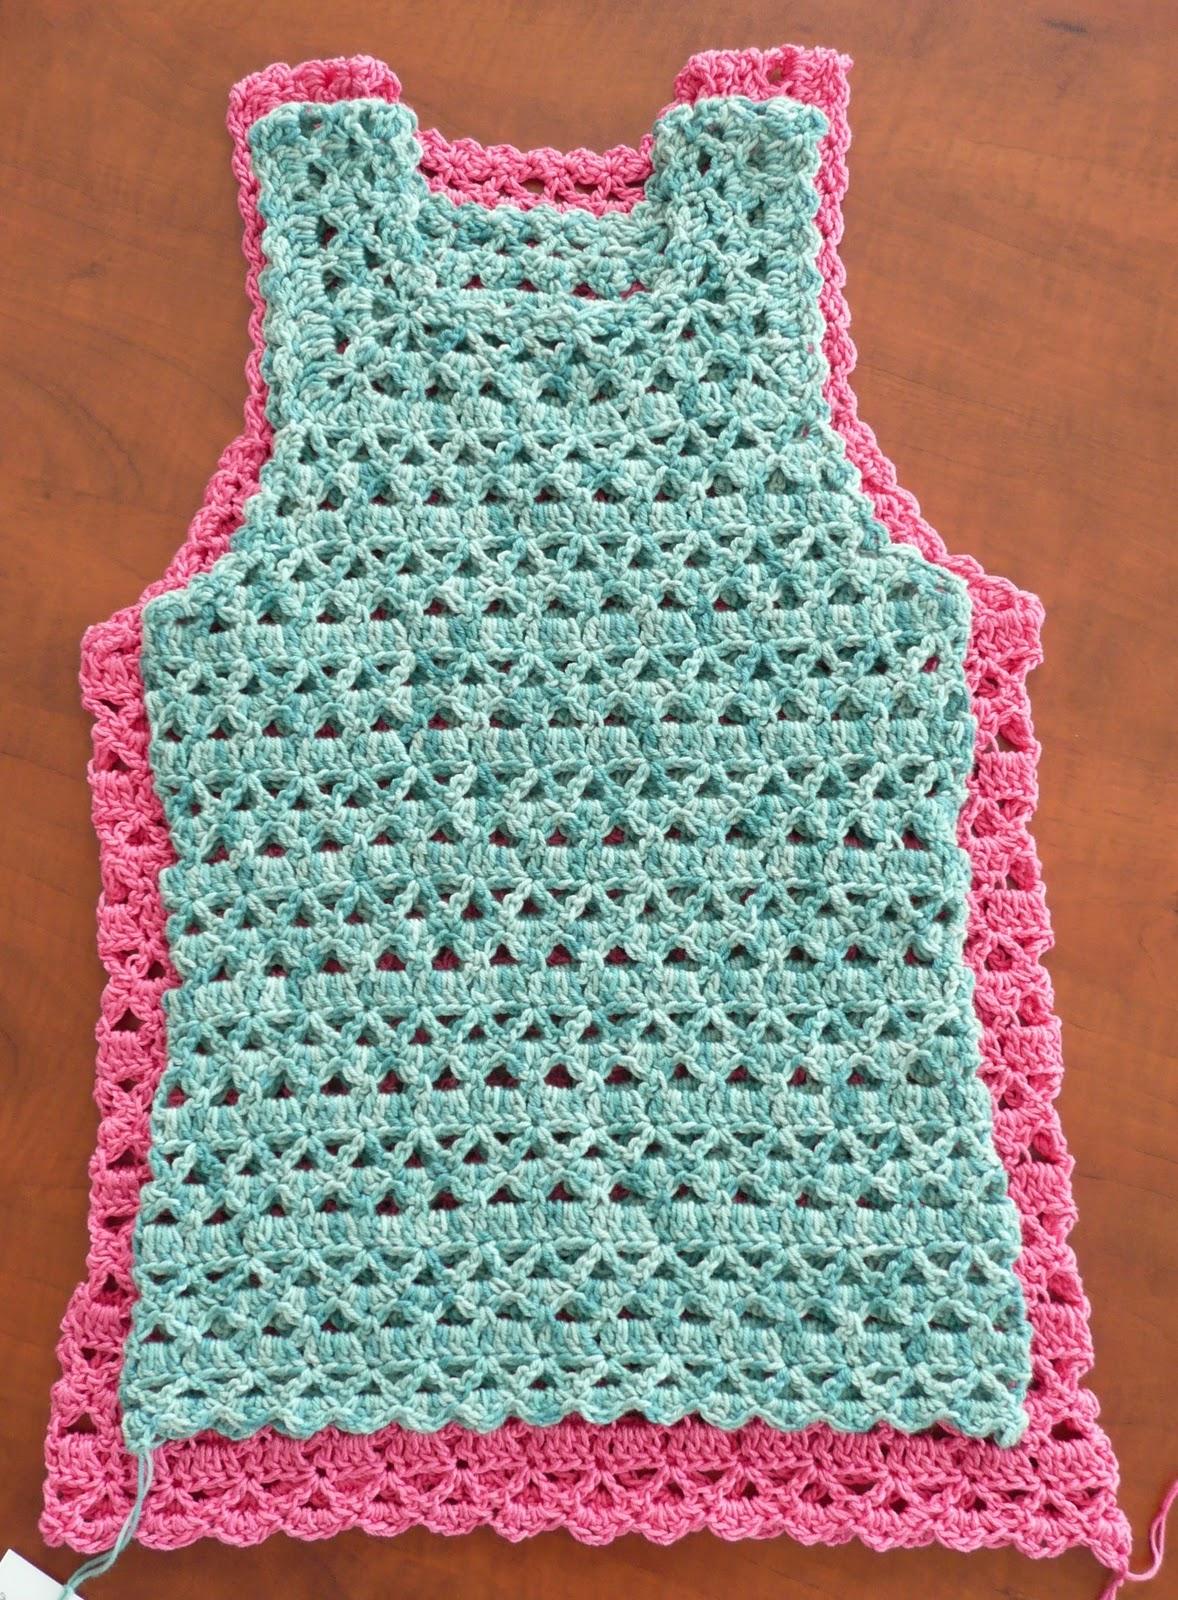 Crochet Gauge : DJC2: Tank Girl = Crochet Gauge Quandry Doris Chan Crochet